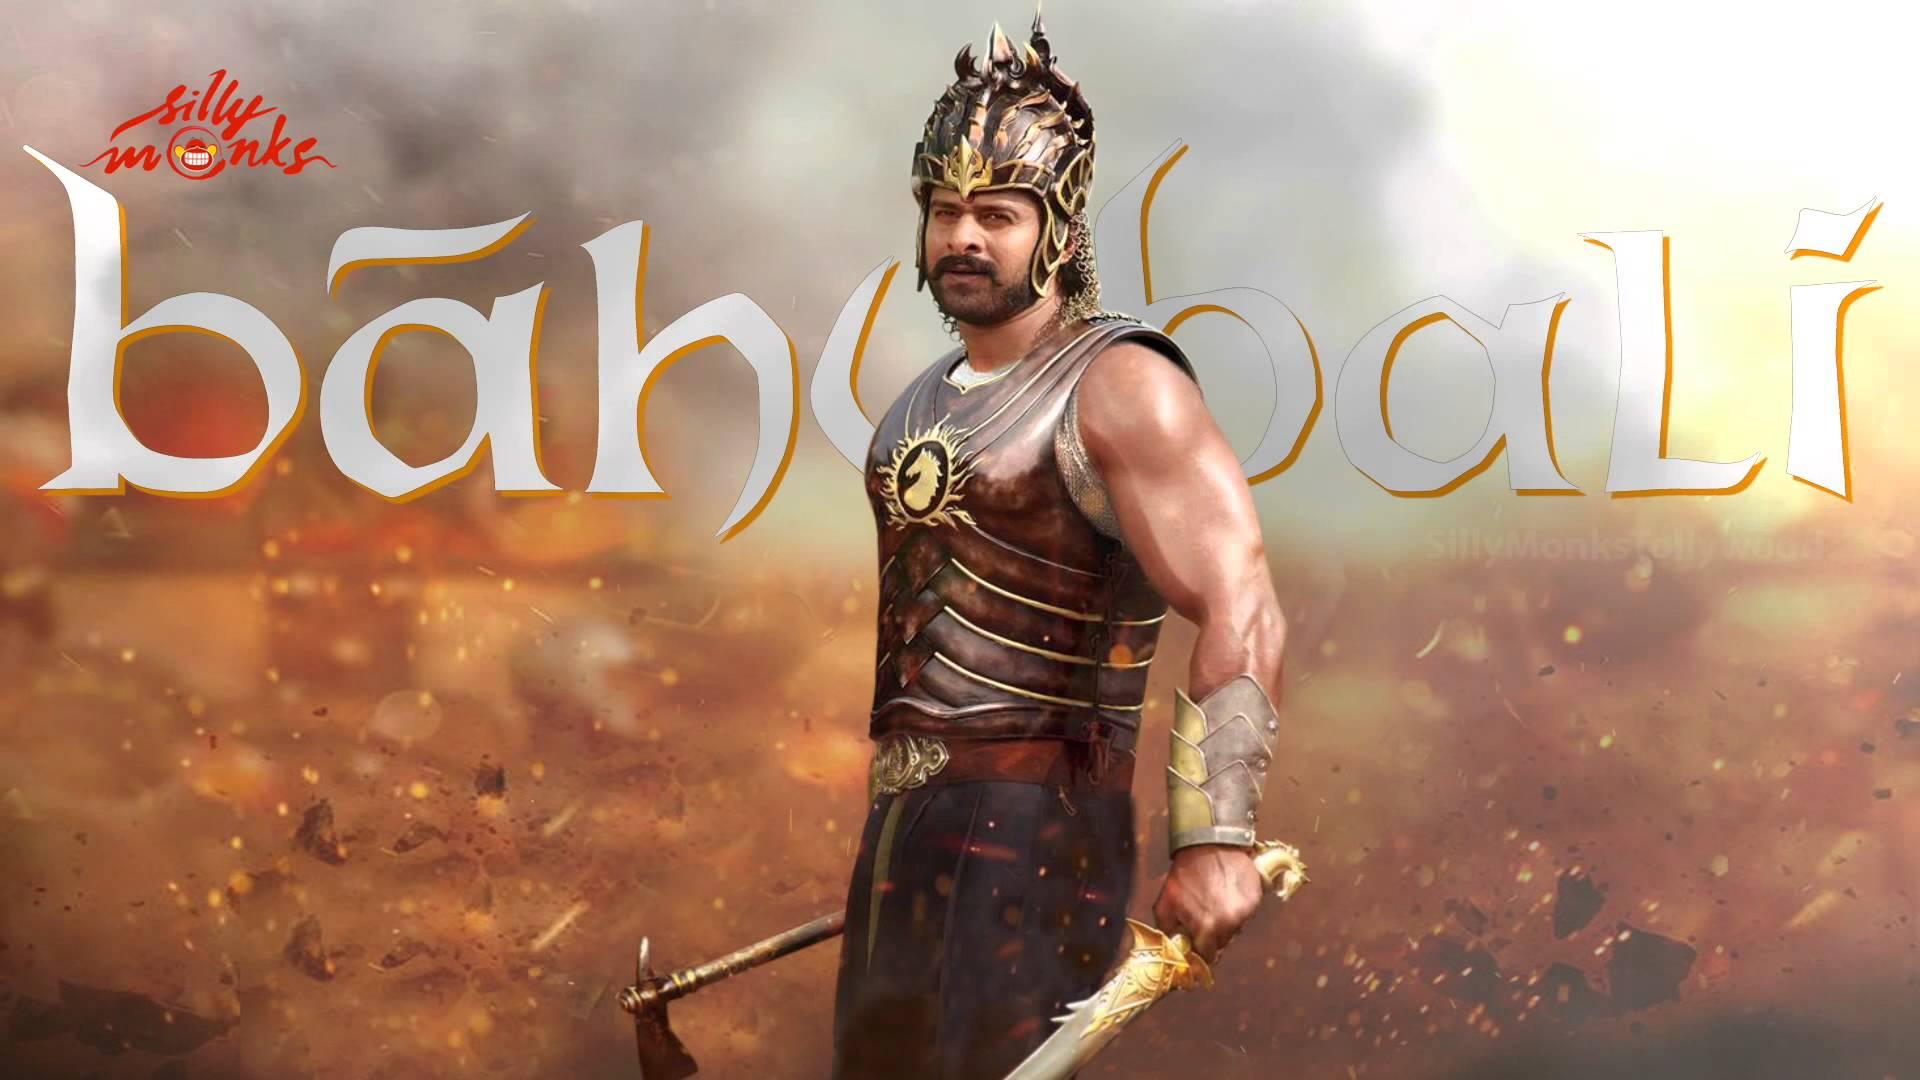 bahubali trailer, release date